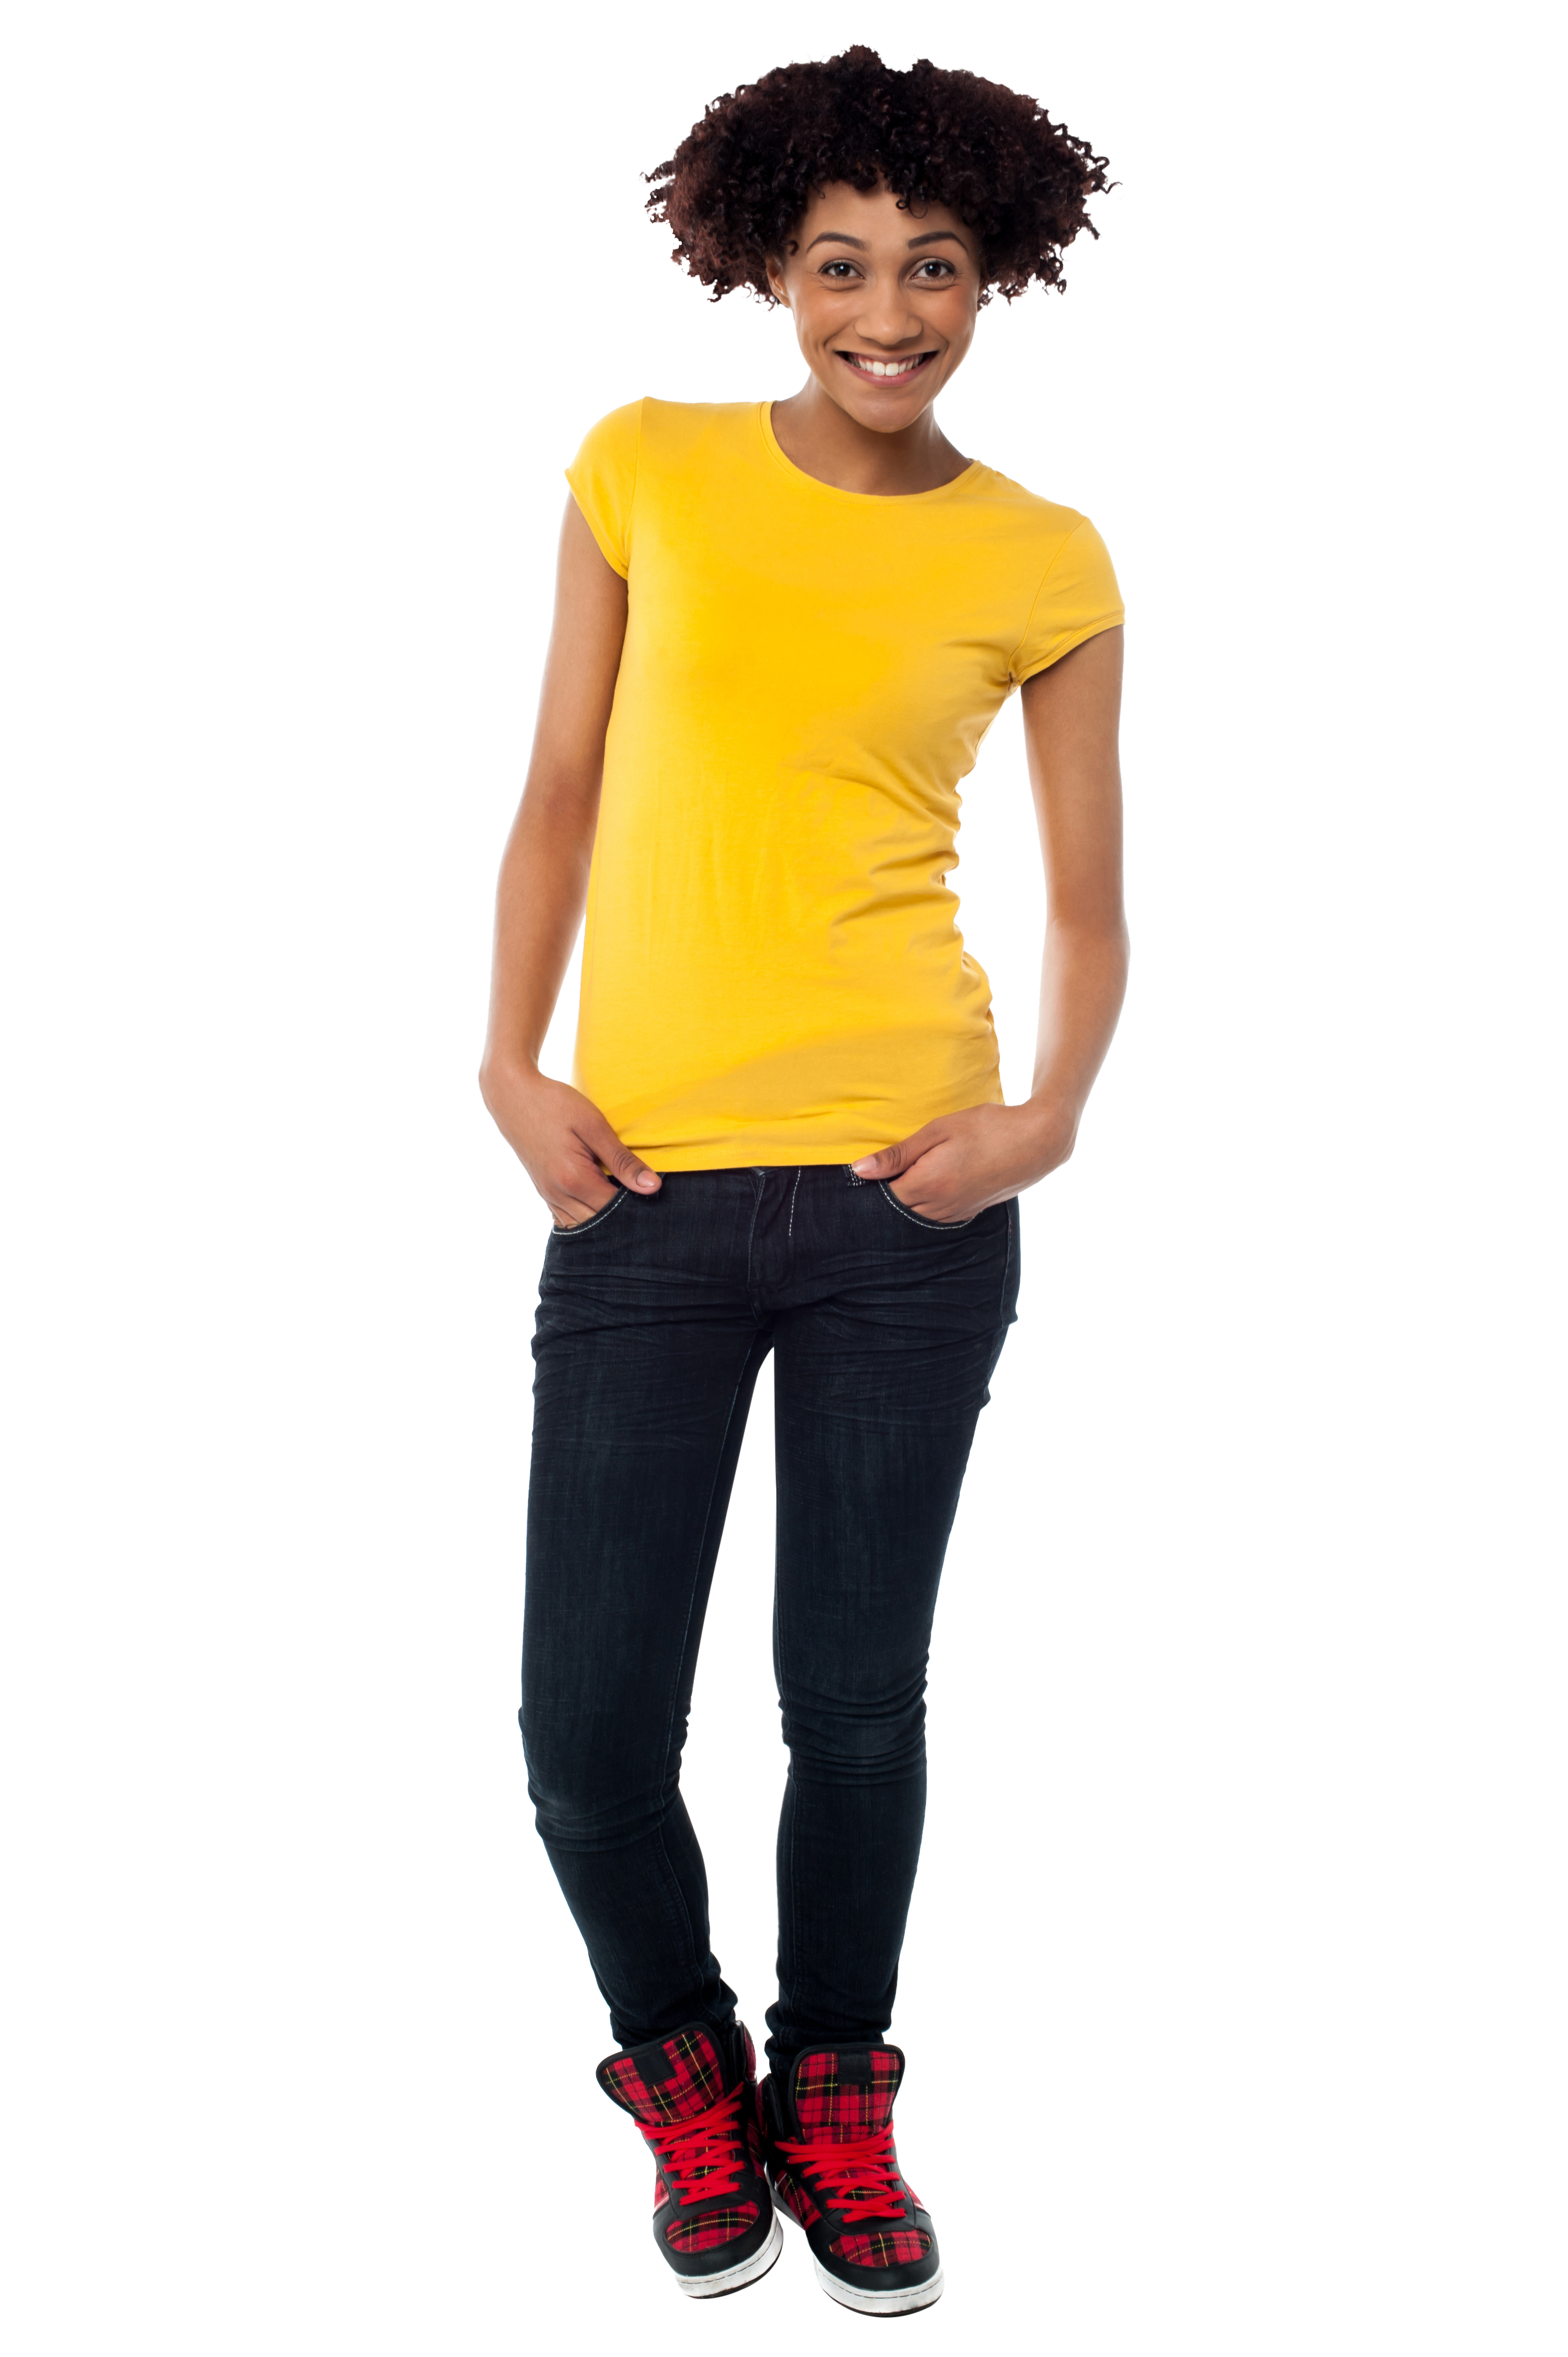 Standing Women PNG Image